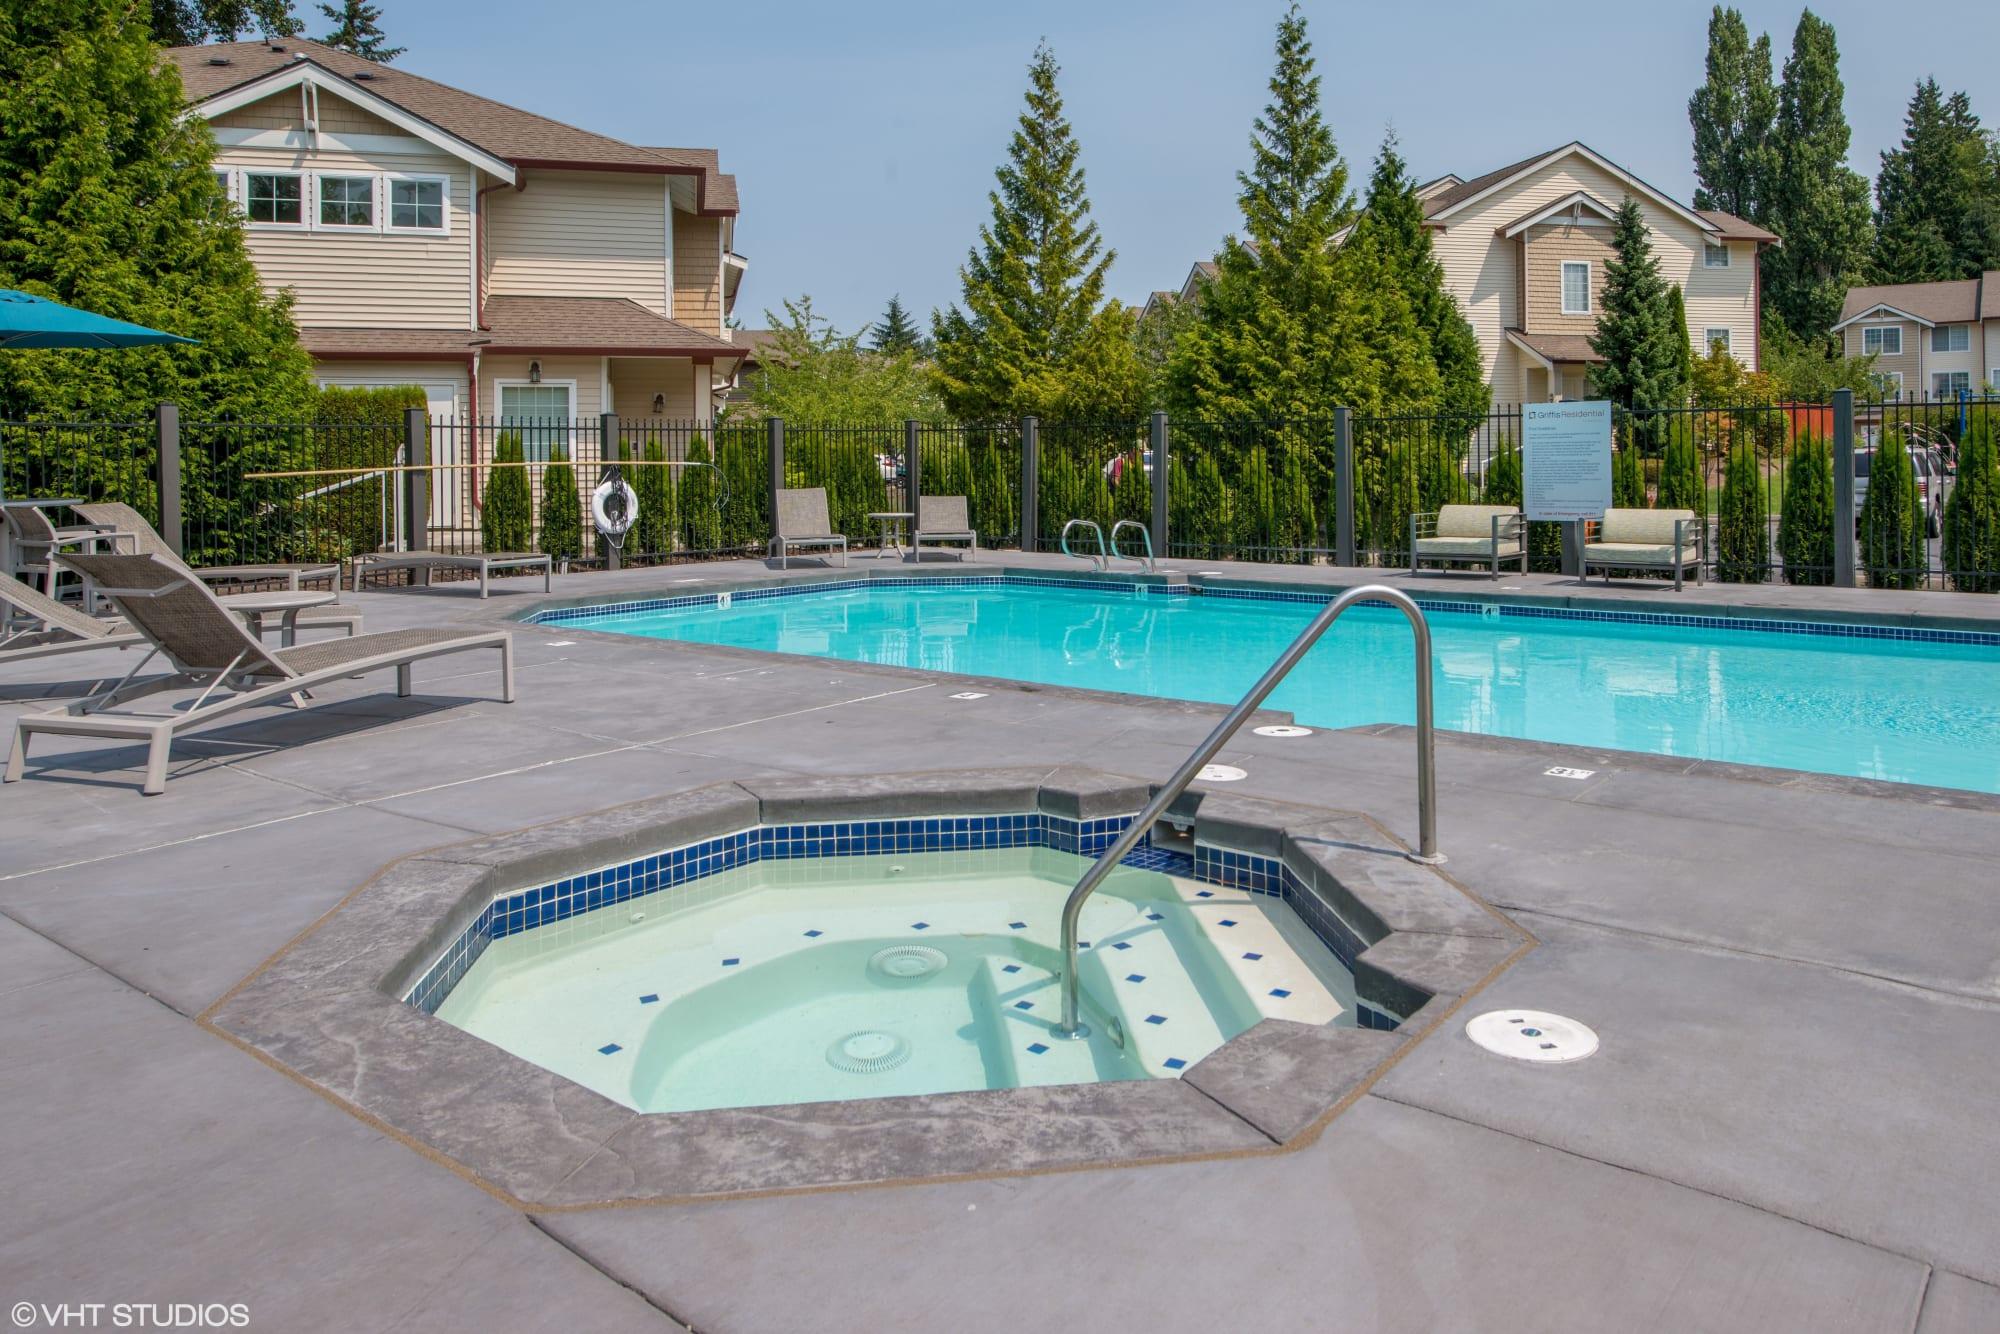 The hot tub at Brookside Village in Auburn, Washington